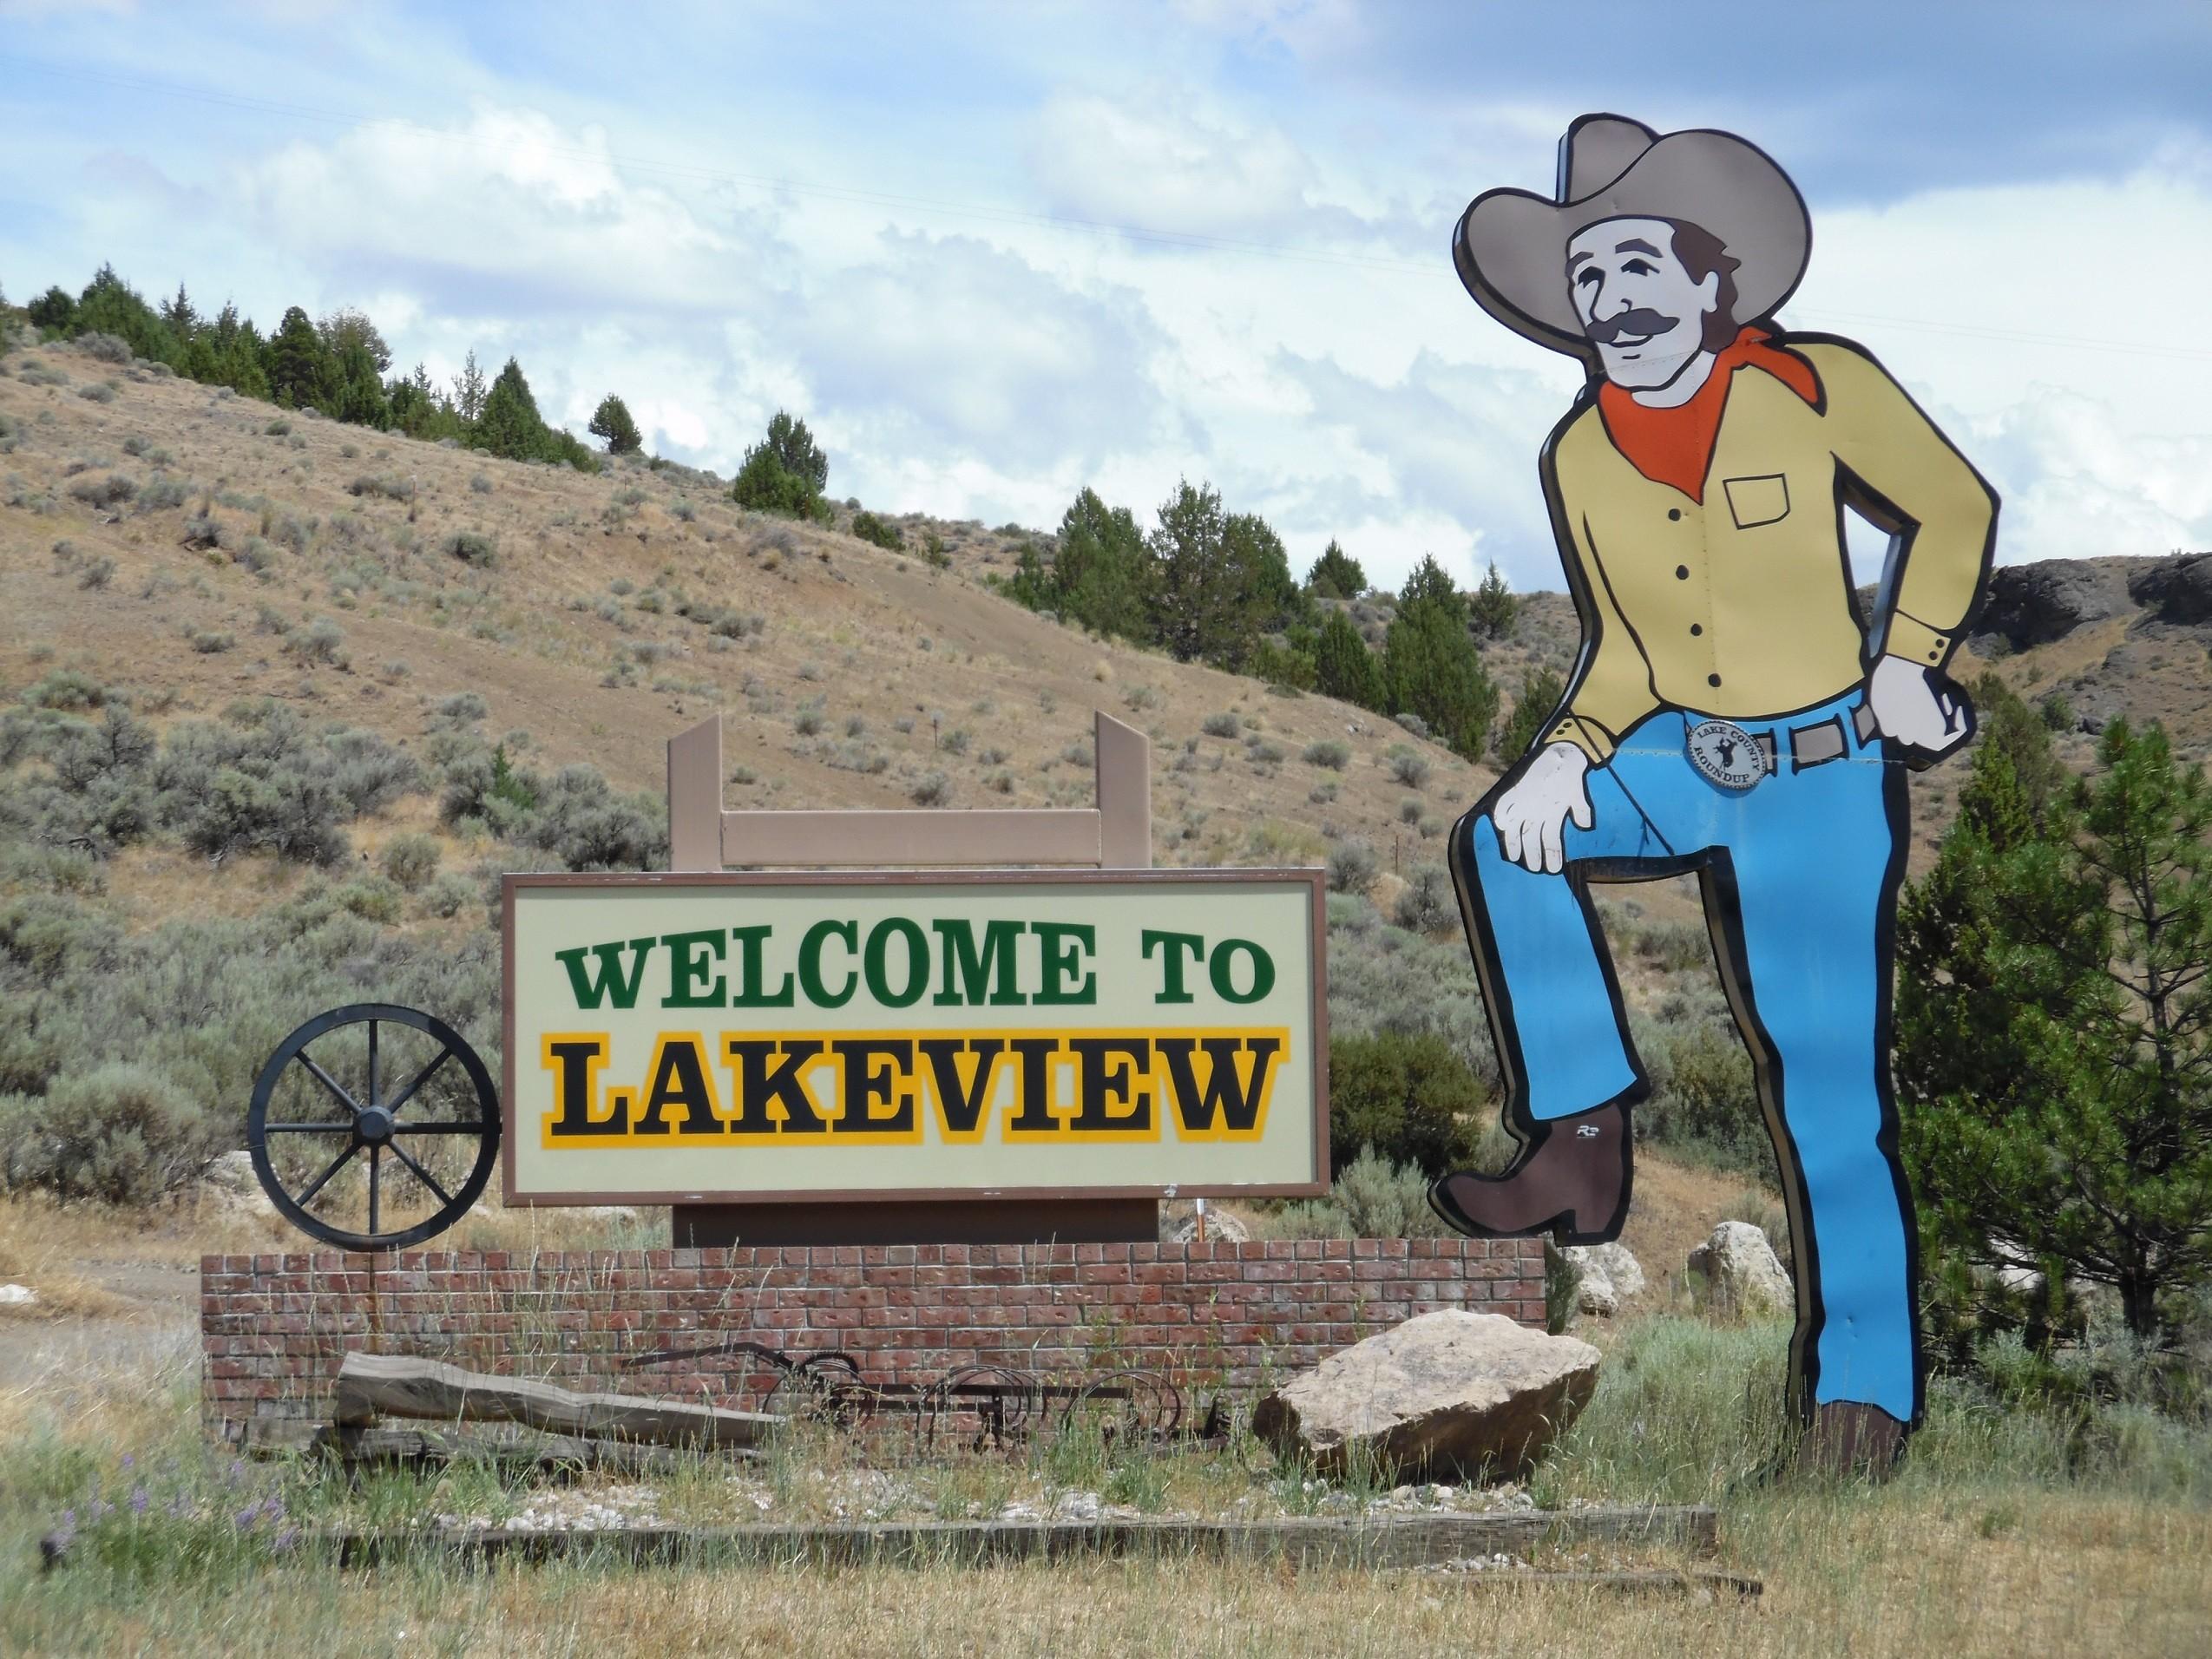 Lakeview, Oregon